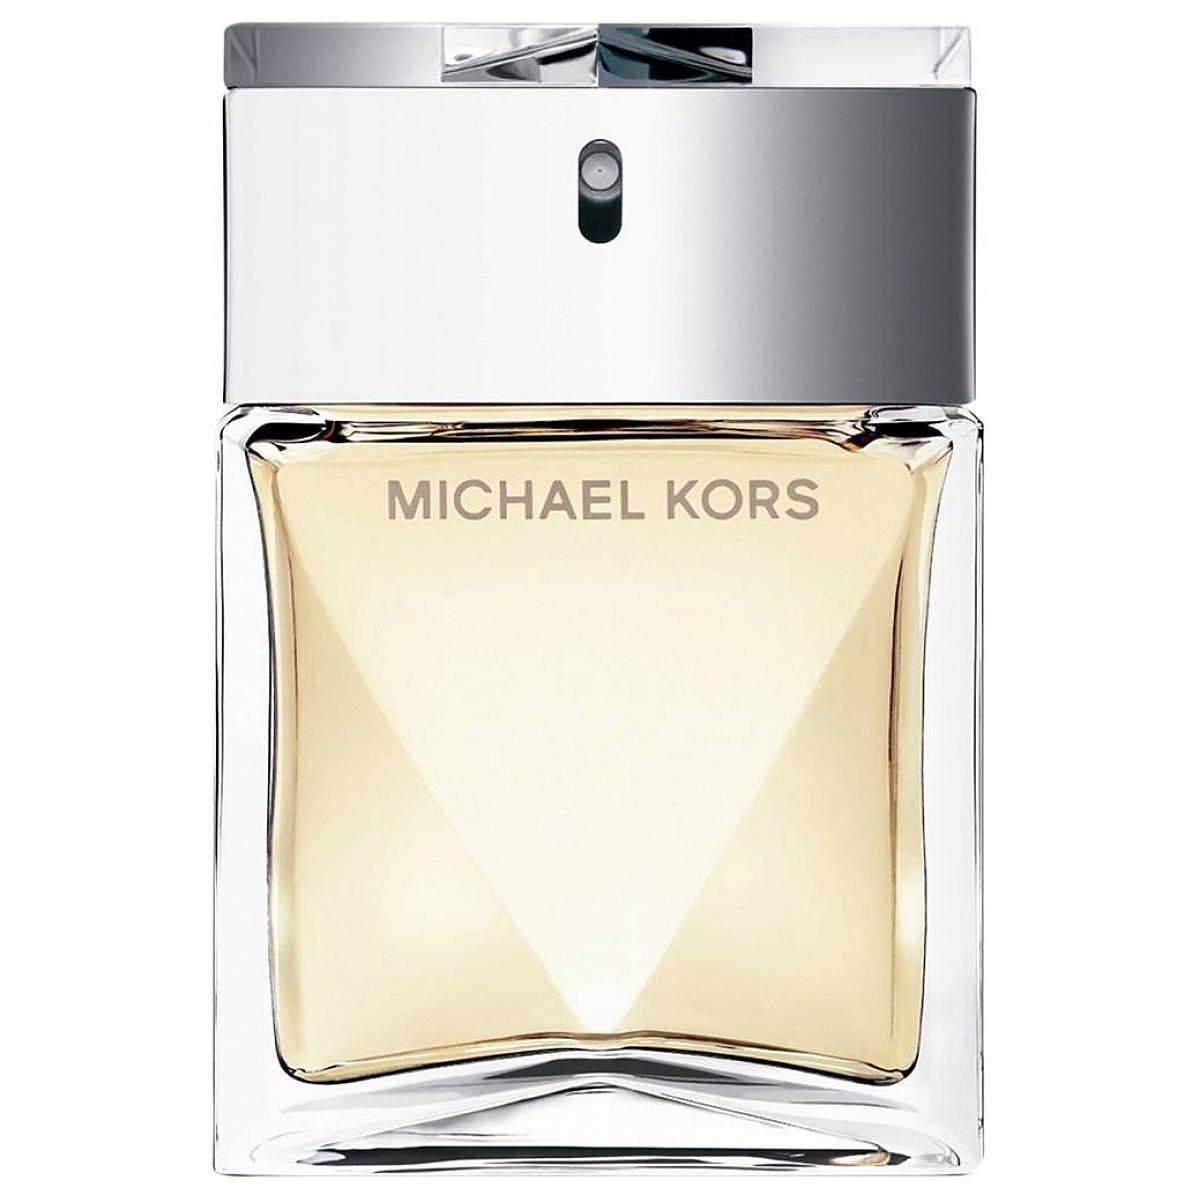 d748d80770e0e Michael Kors Woman tester Woda perfumowana spray 100ml - Testery ...